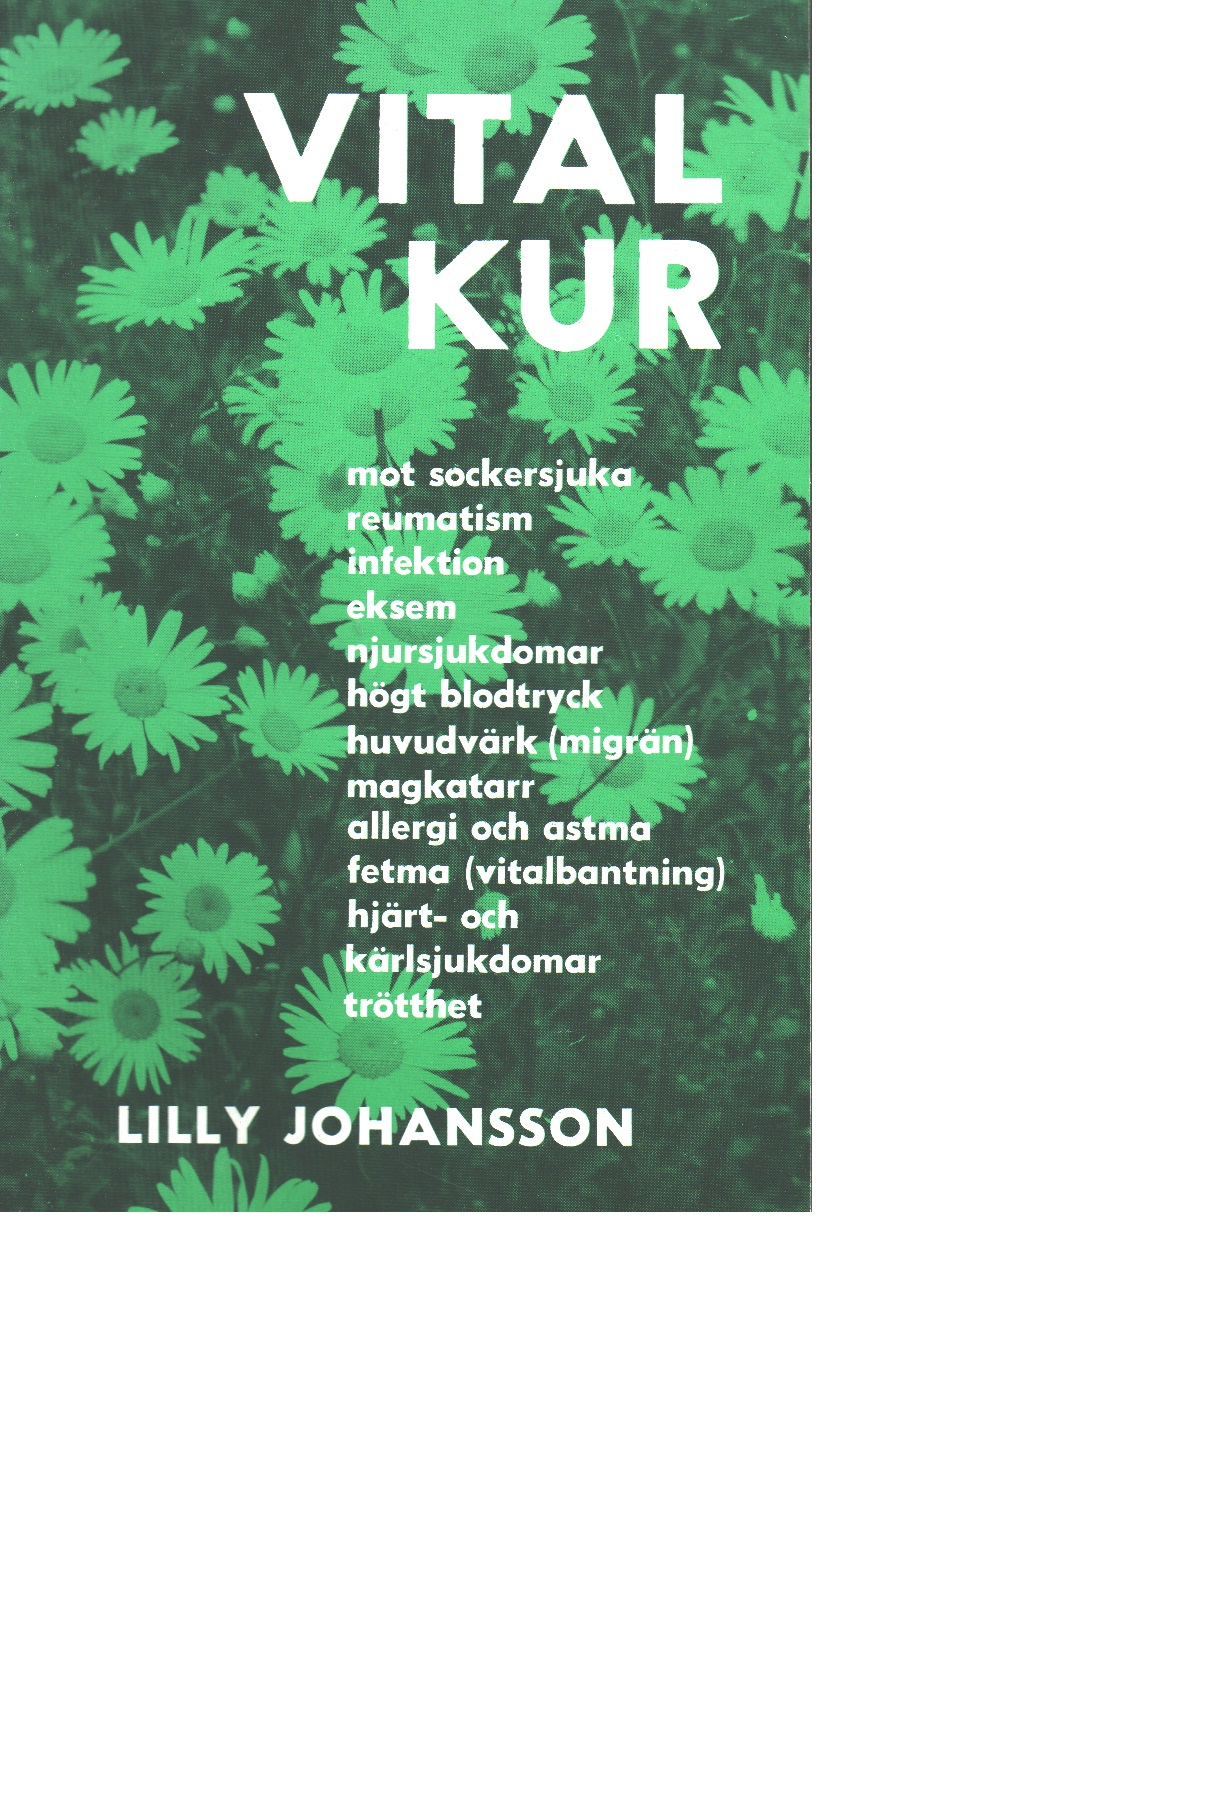 Vital kur - Johansson, Lilly